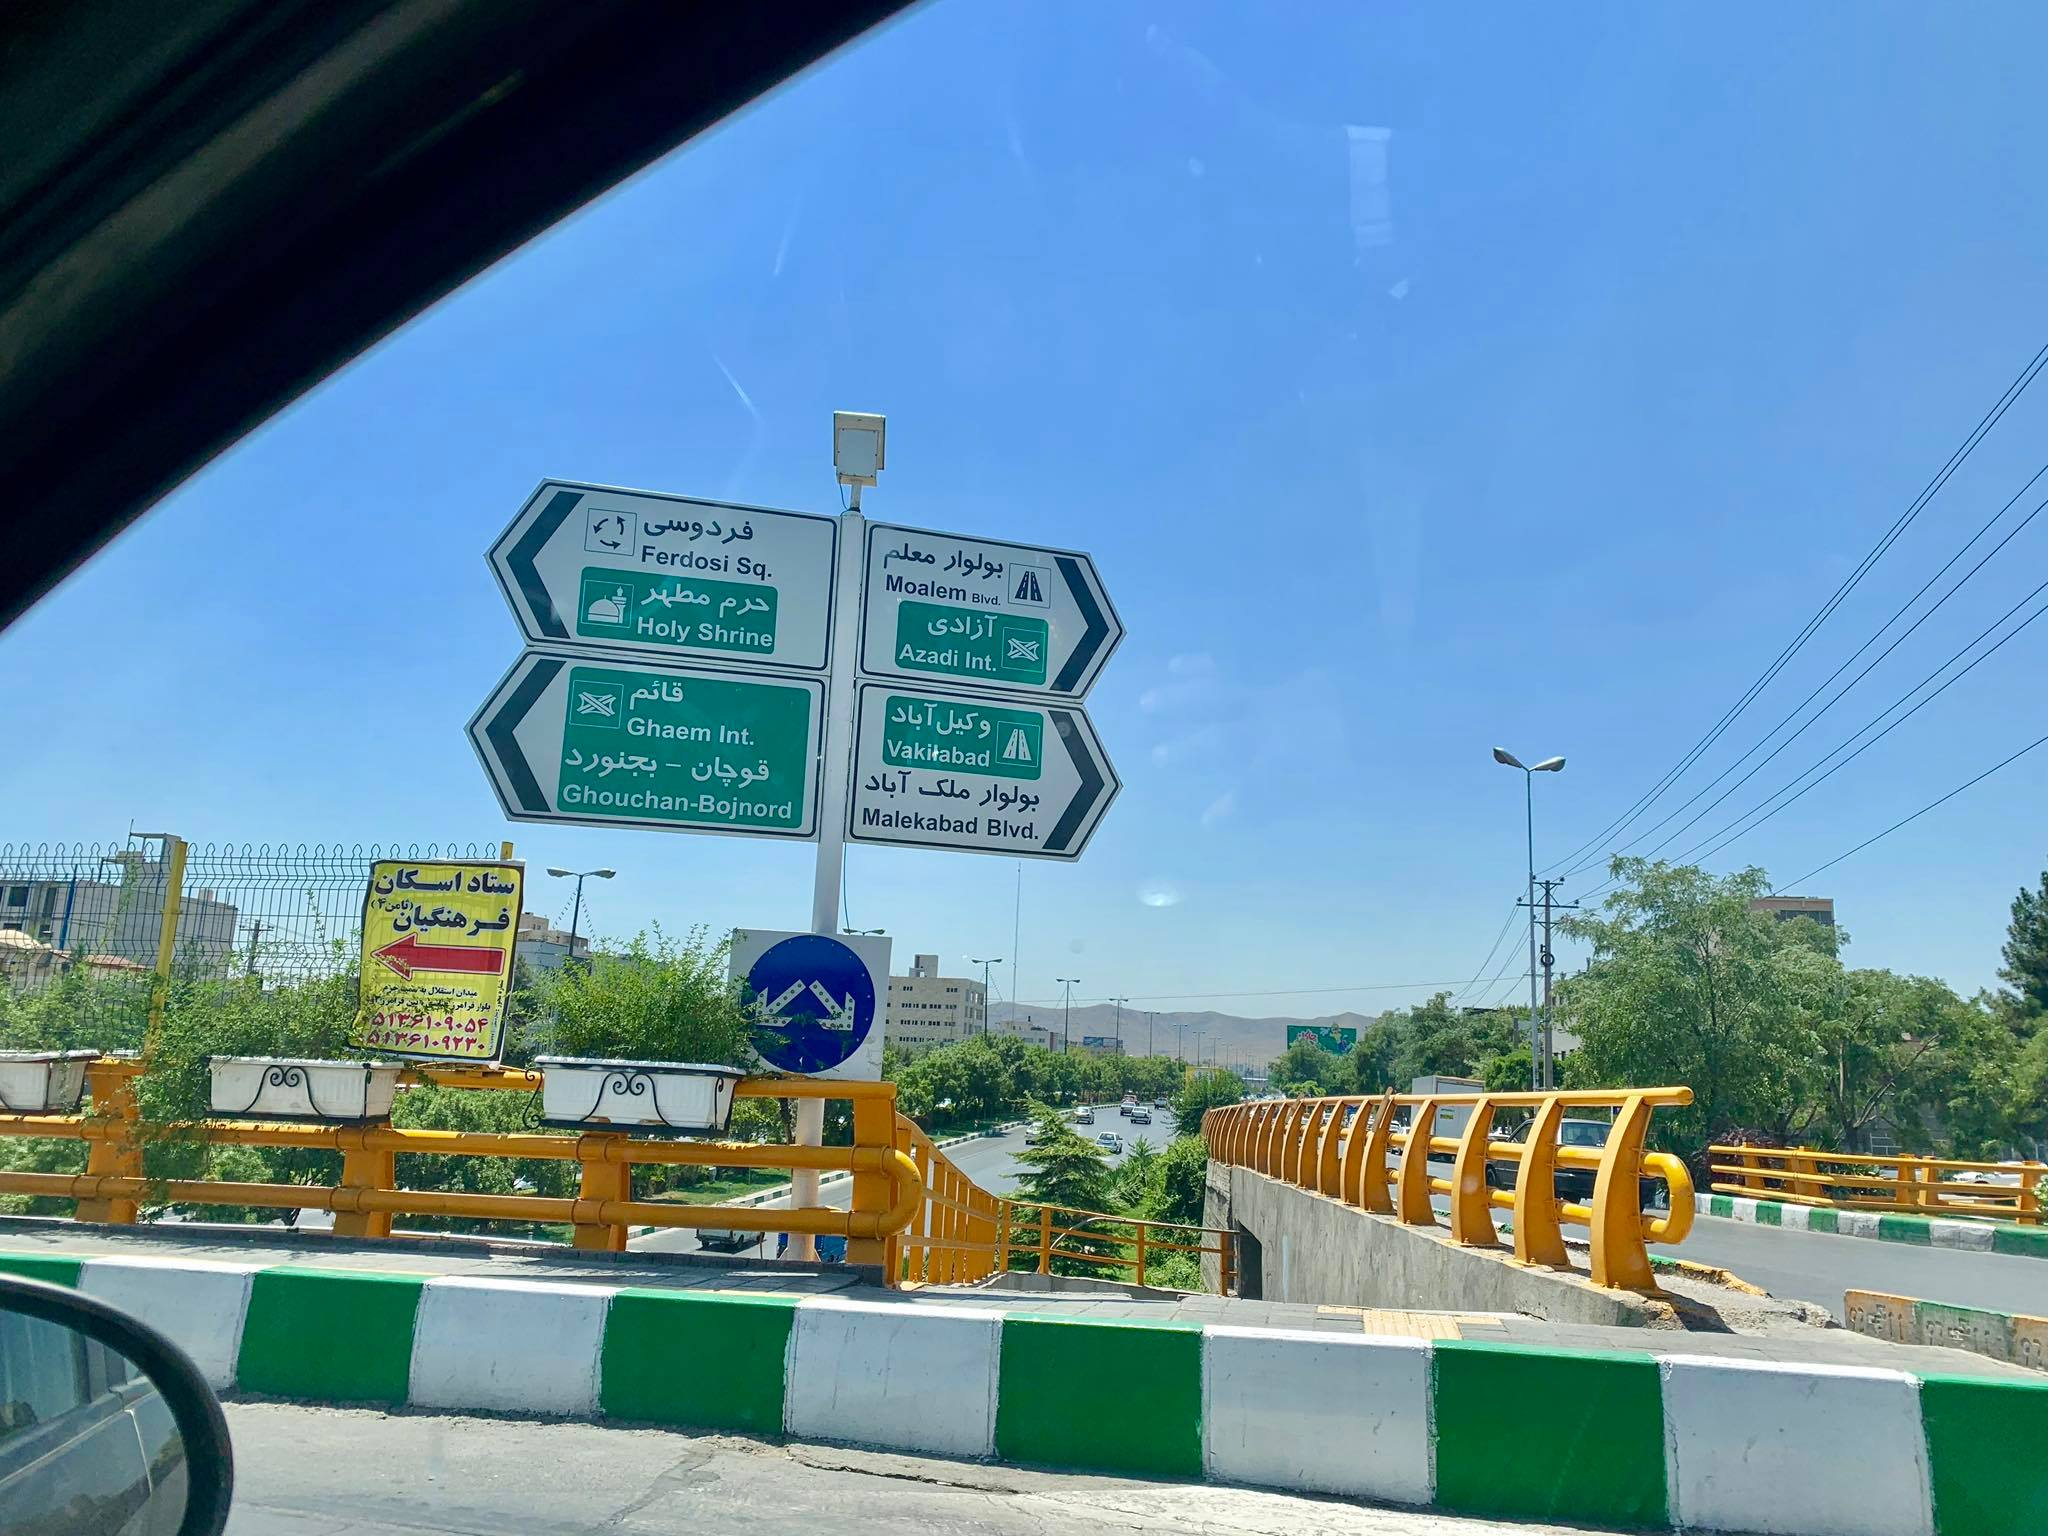 Kach Solo Travels in 2019 Overnight in Mashhad31.jpg